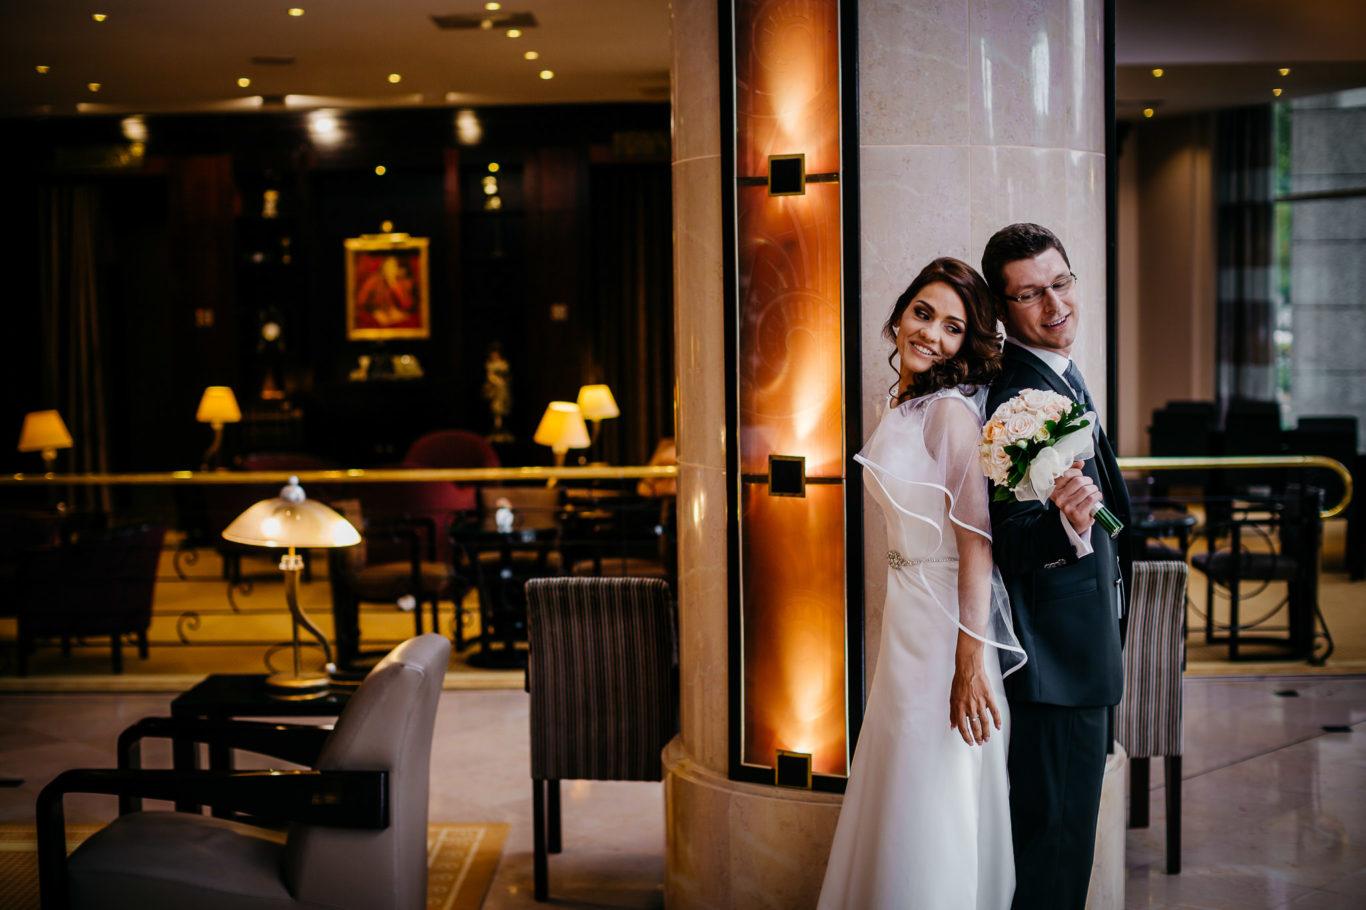 0285-fotografie-nunta-bucuresti-dana-radu-fotograf-ciprian-dumitrescu-cd2_6880